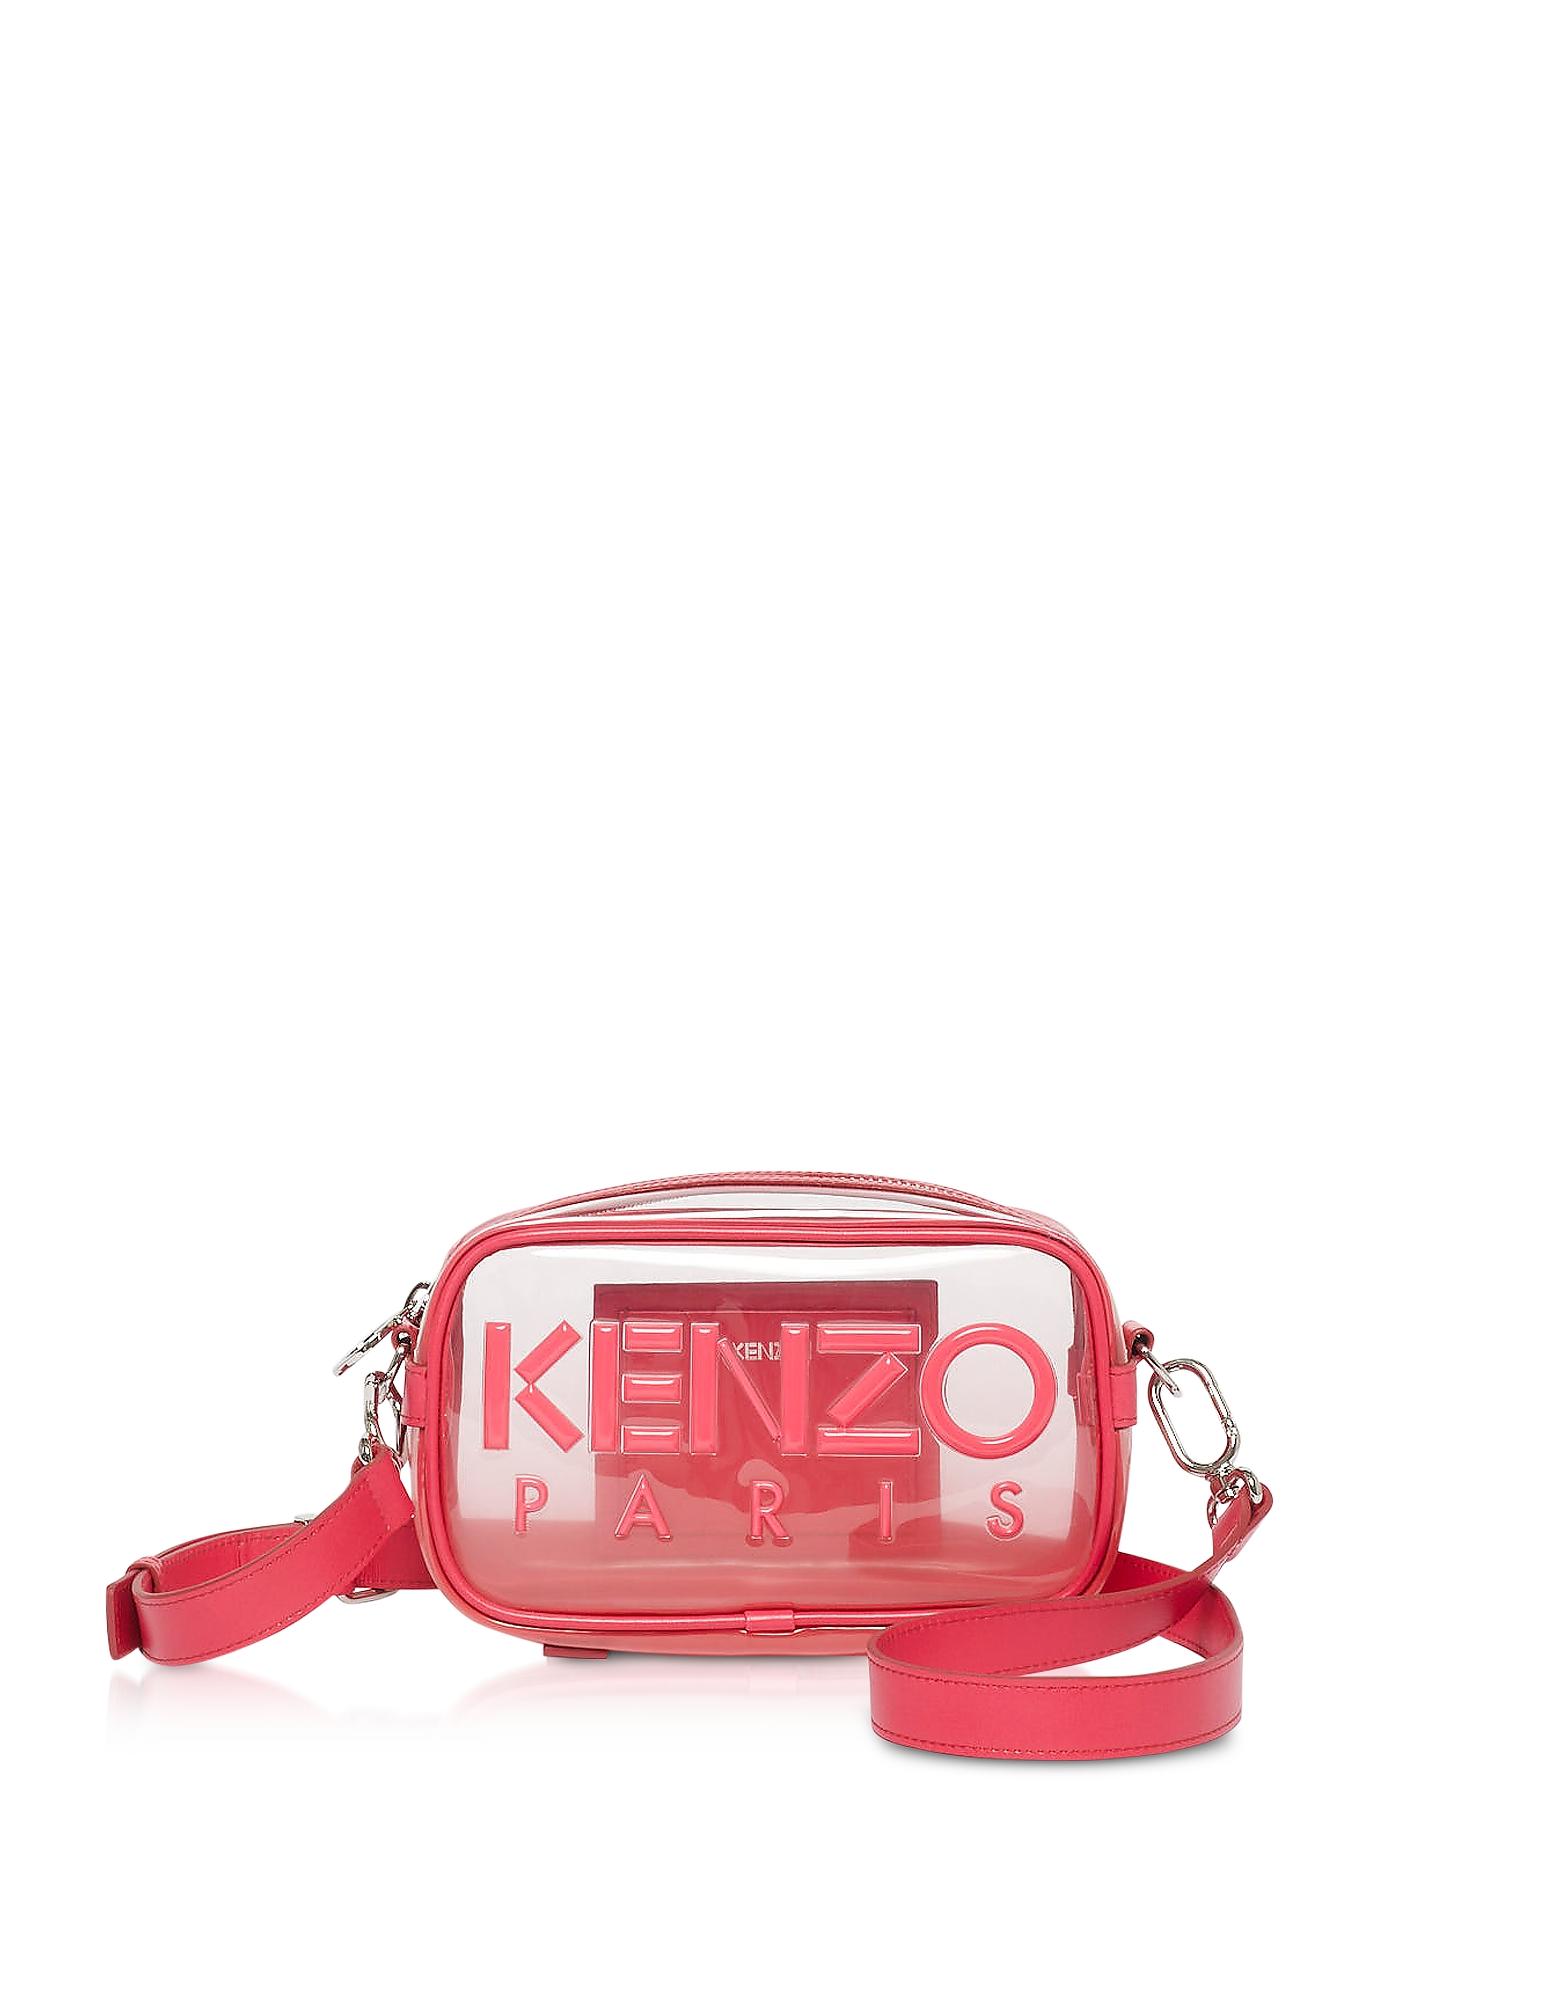 Kenzo Messengers TRANSPARENT KOMBO CROSSBODY BAG